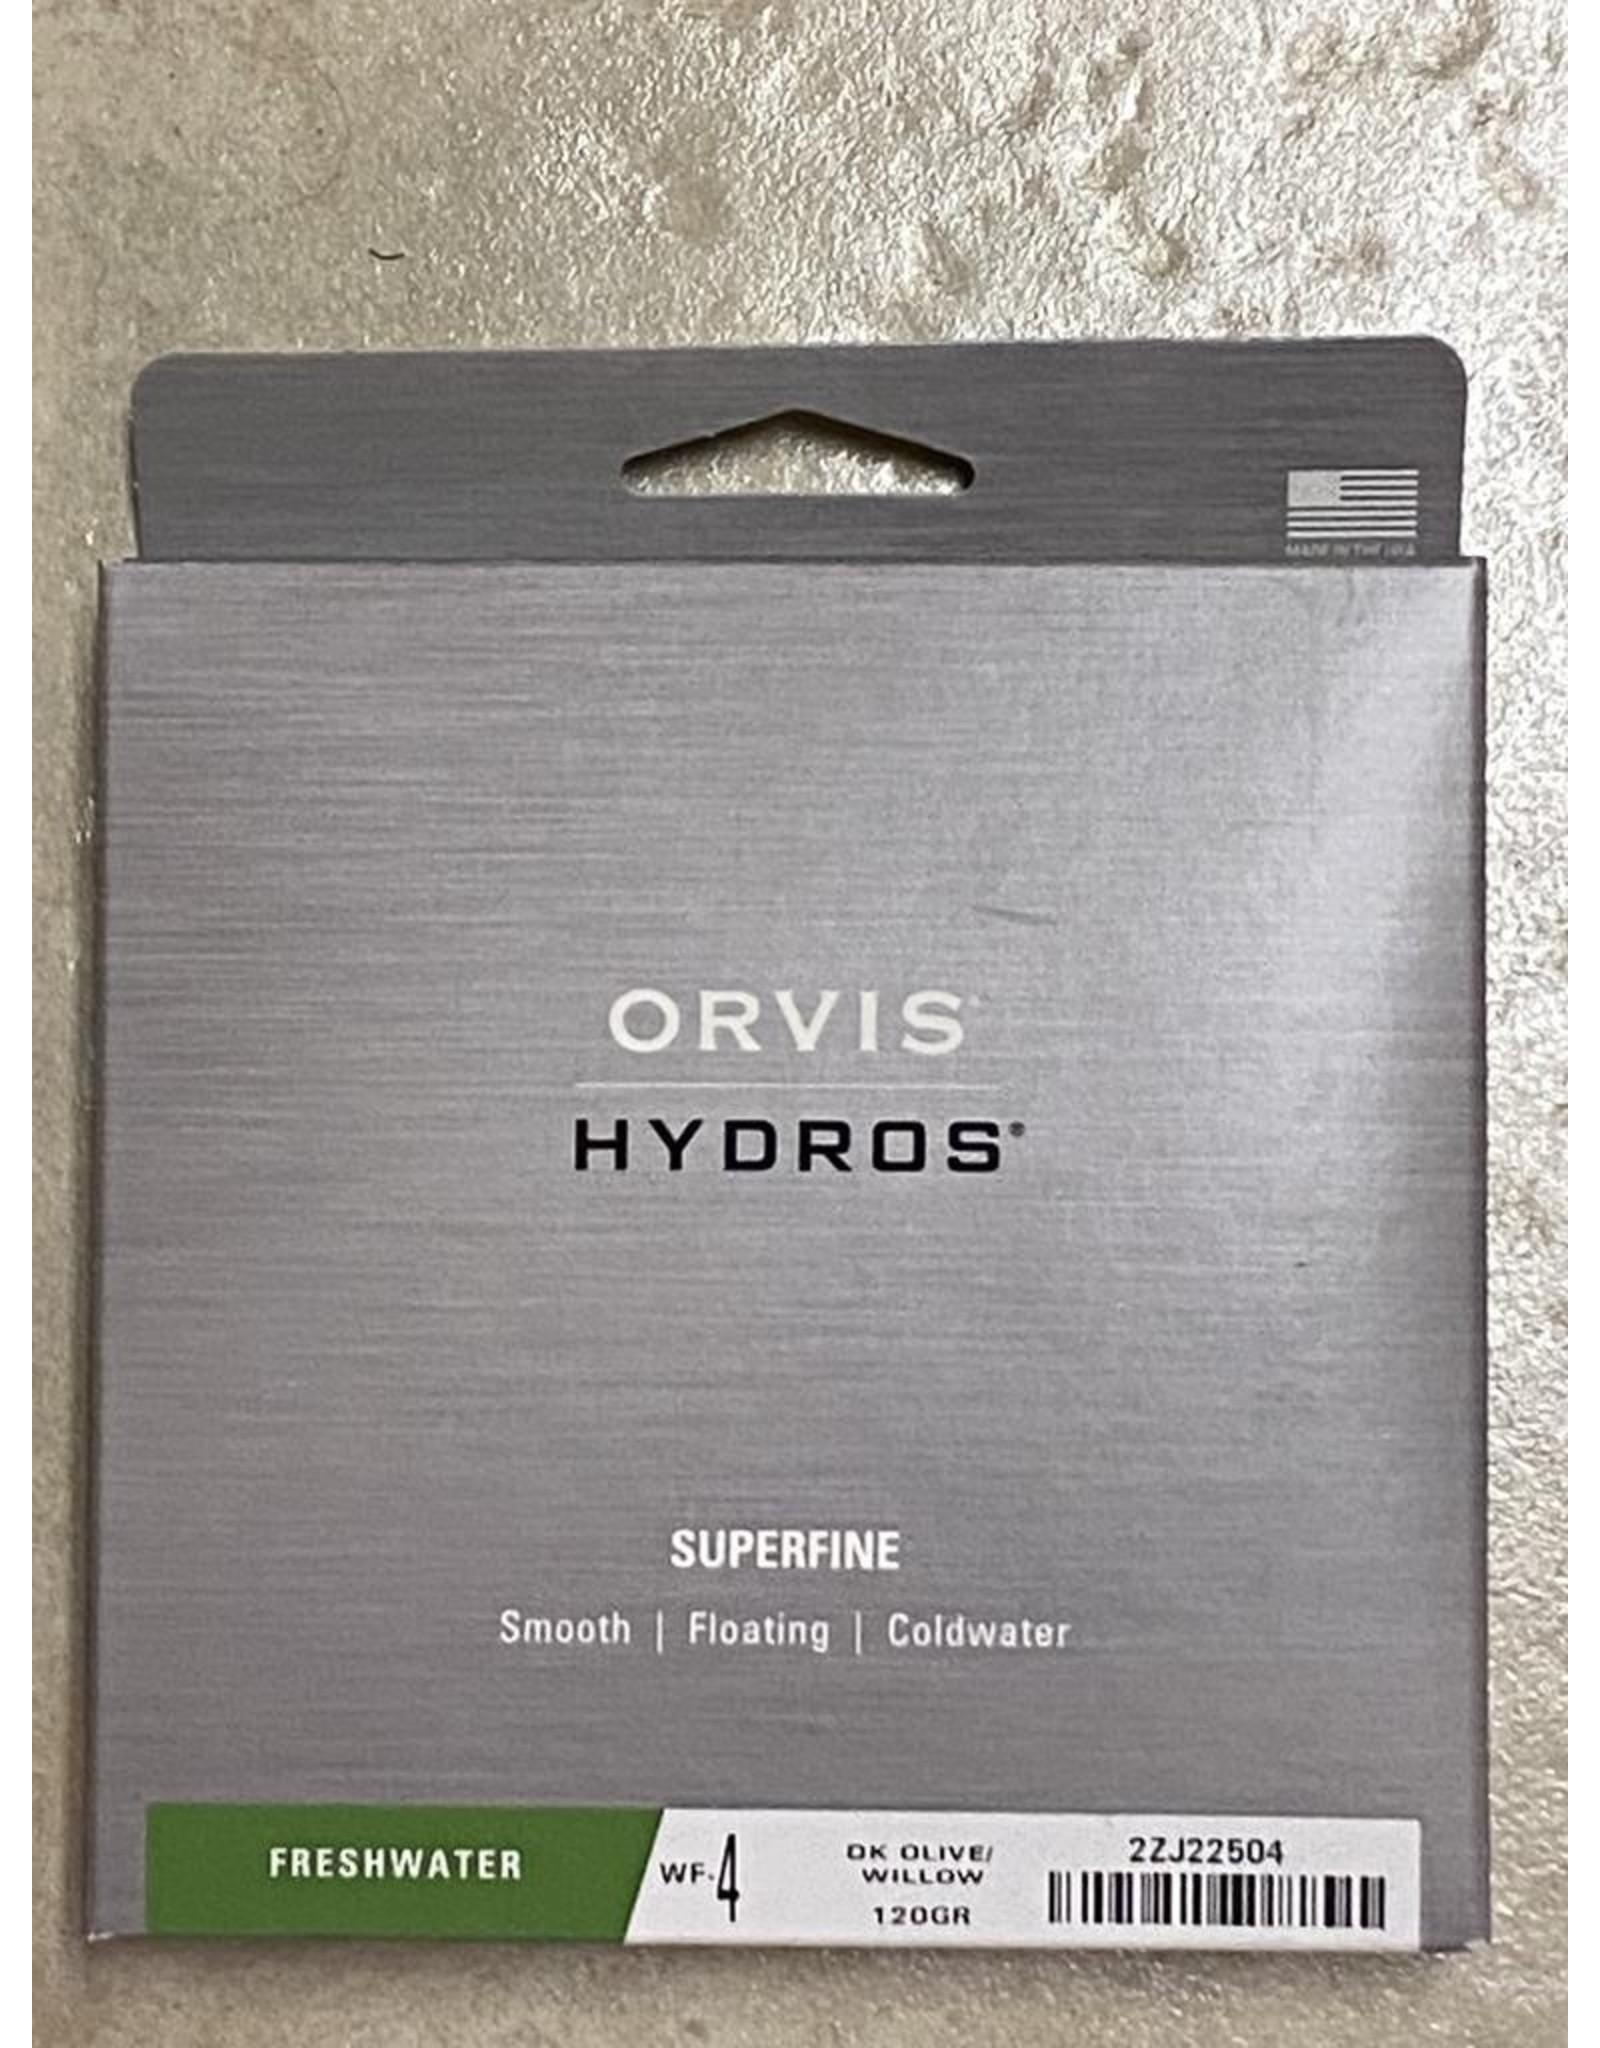 Orvis NEW ORVIS Hydros Superfine Fly Line